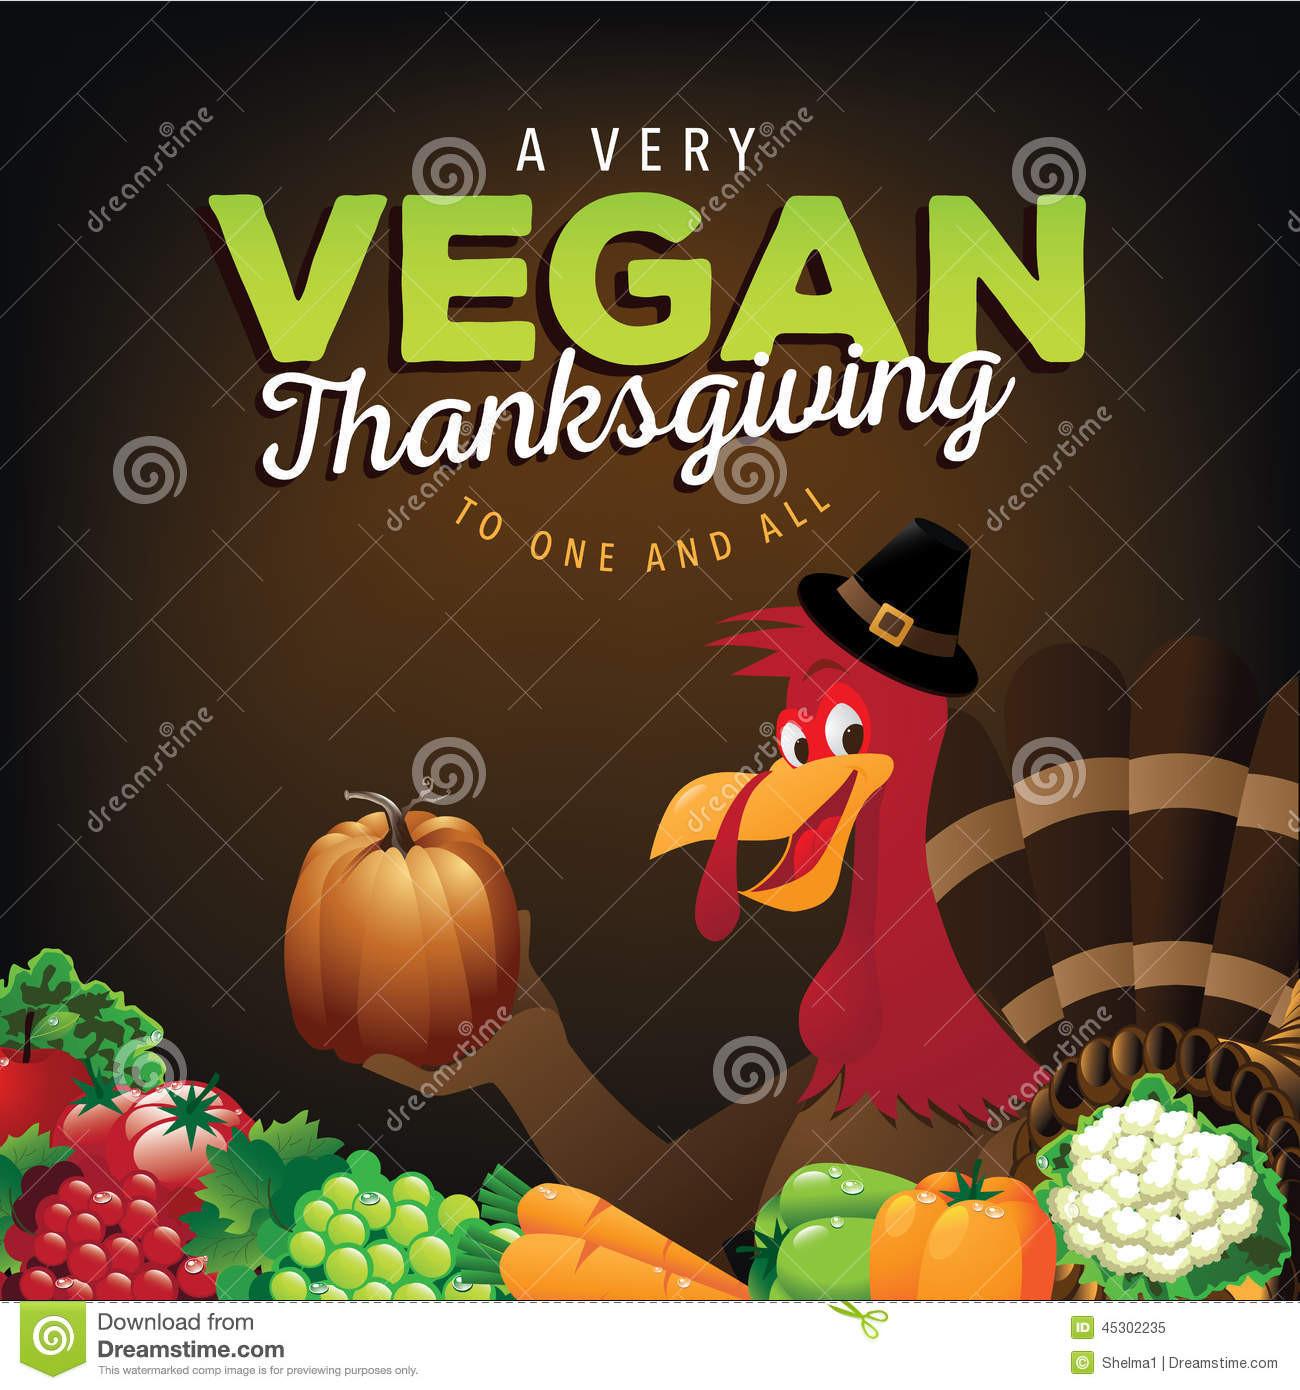 Happy Thanksgiving Vegetarian  Happy Vegan Thanksgiving Greeting Card Design Stock Vector